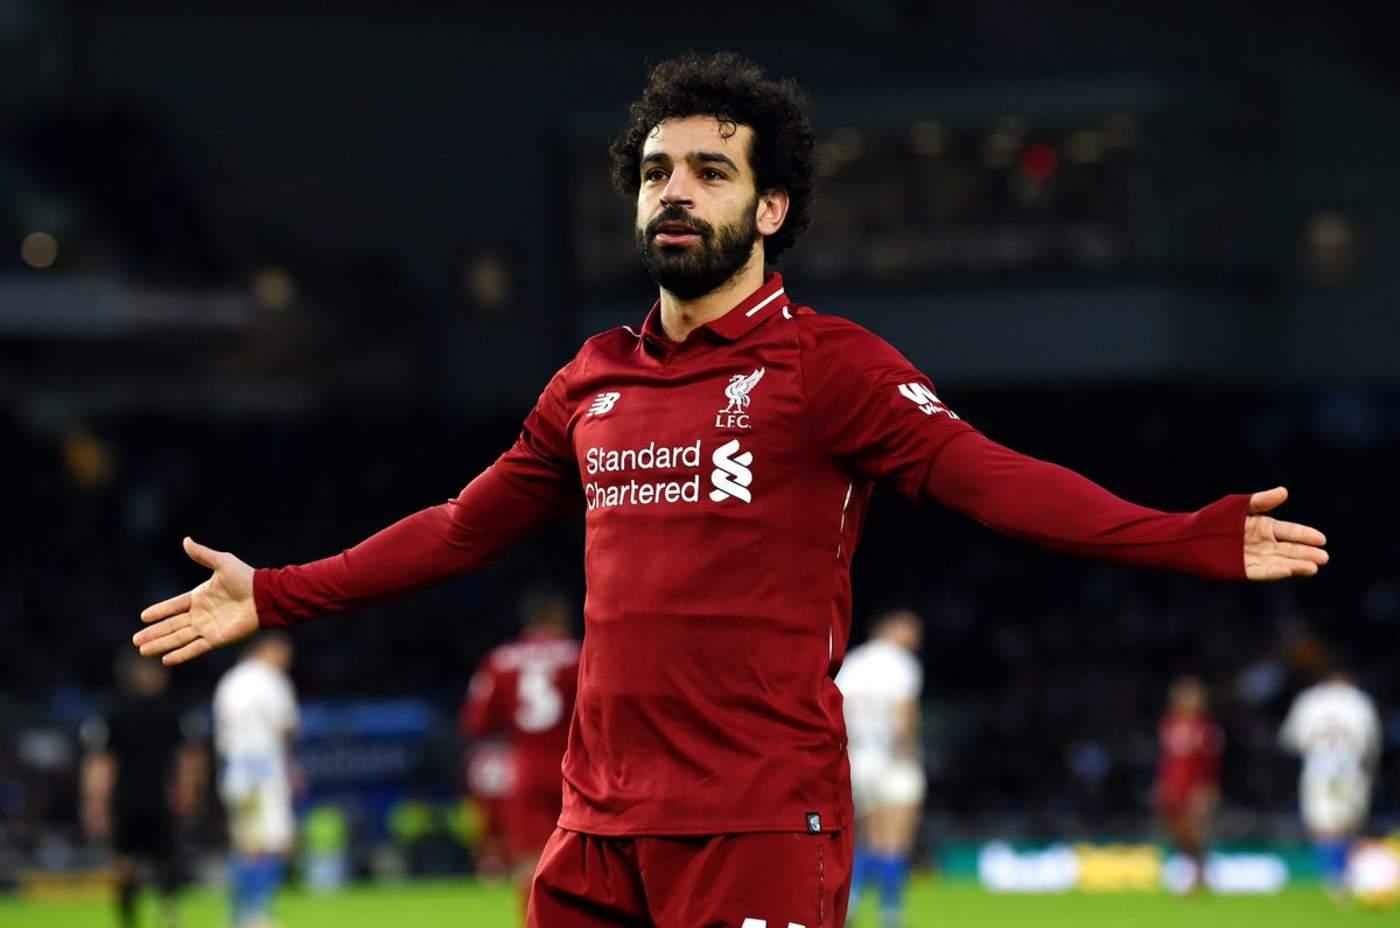 Liverpool gana con un penal cobrado por Salah, El Siglo de Torreón